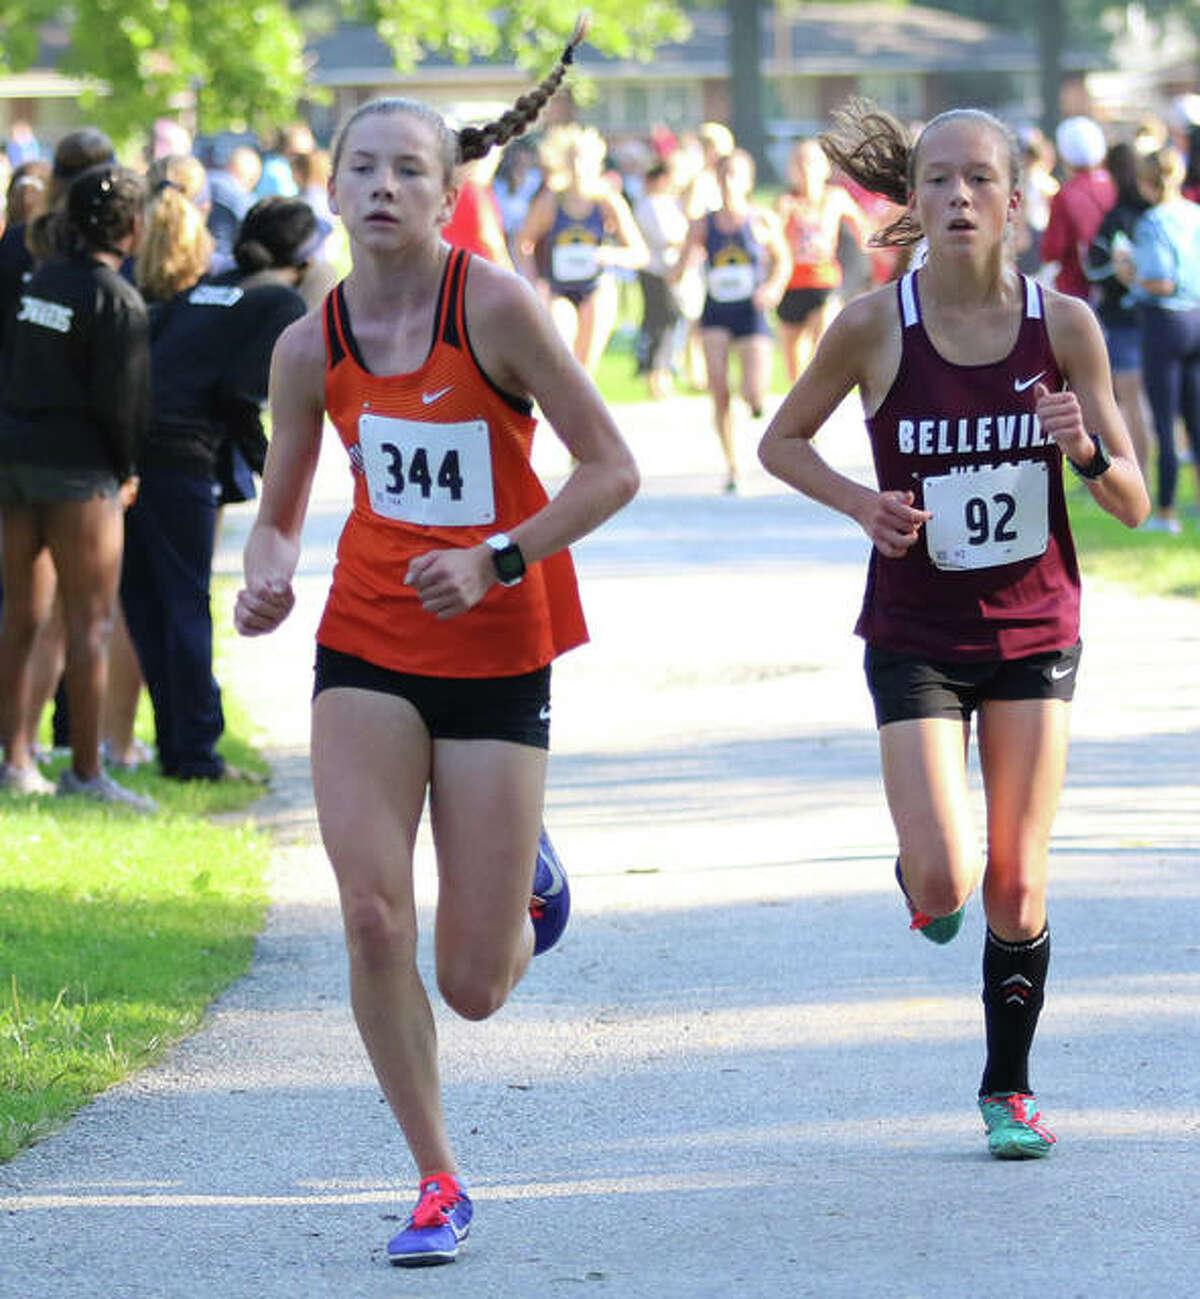 Edwardsville freshman Riley Knoyle (right), shown leading Belleville West's Alyssa Elliott midway through the Granite City Invite on Sept. 7.